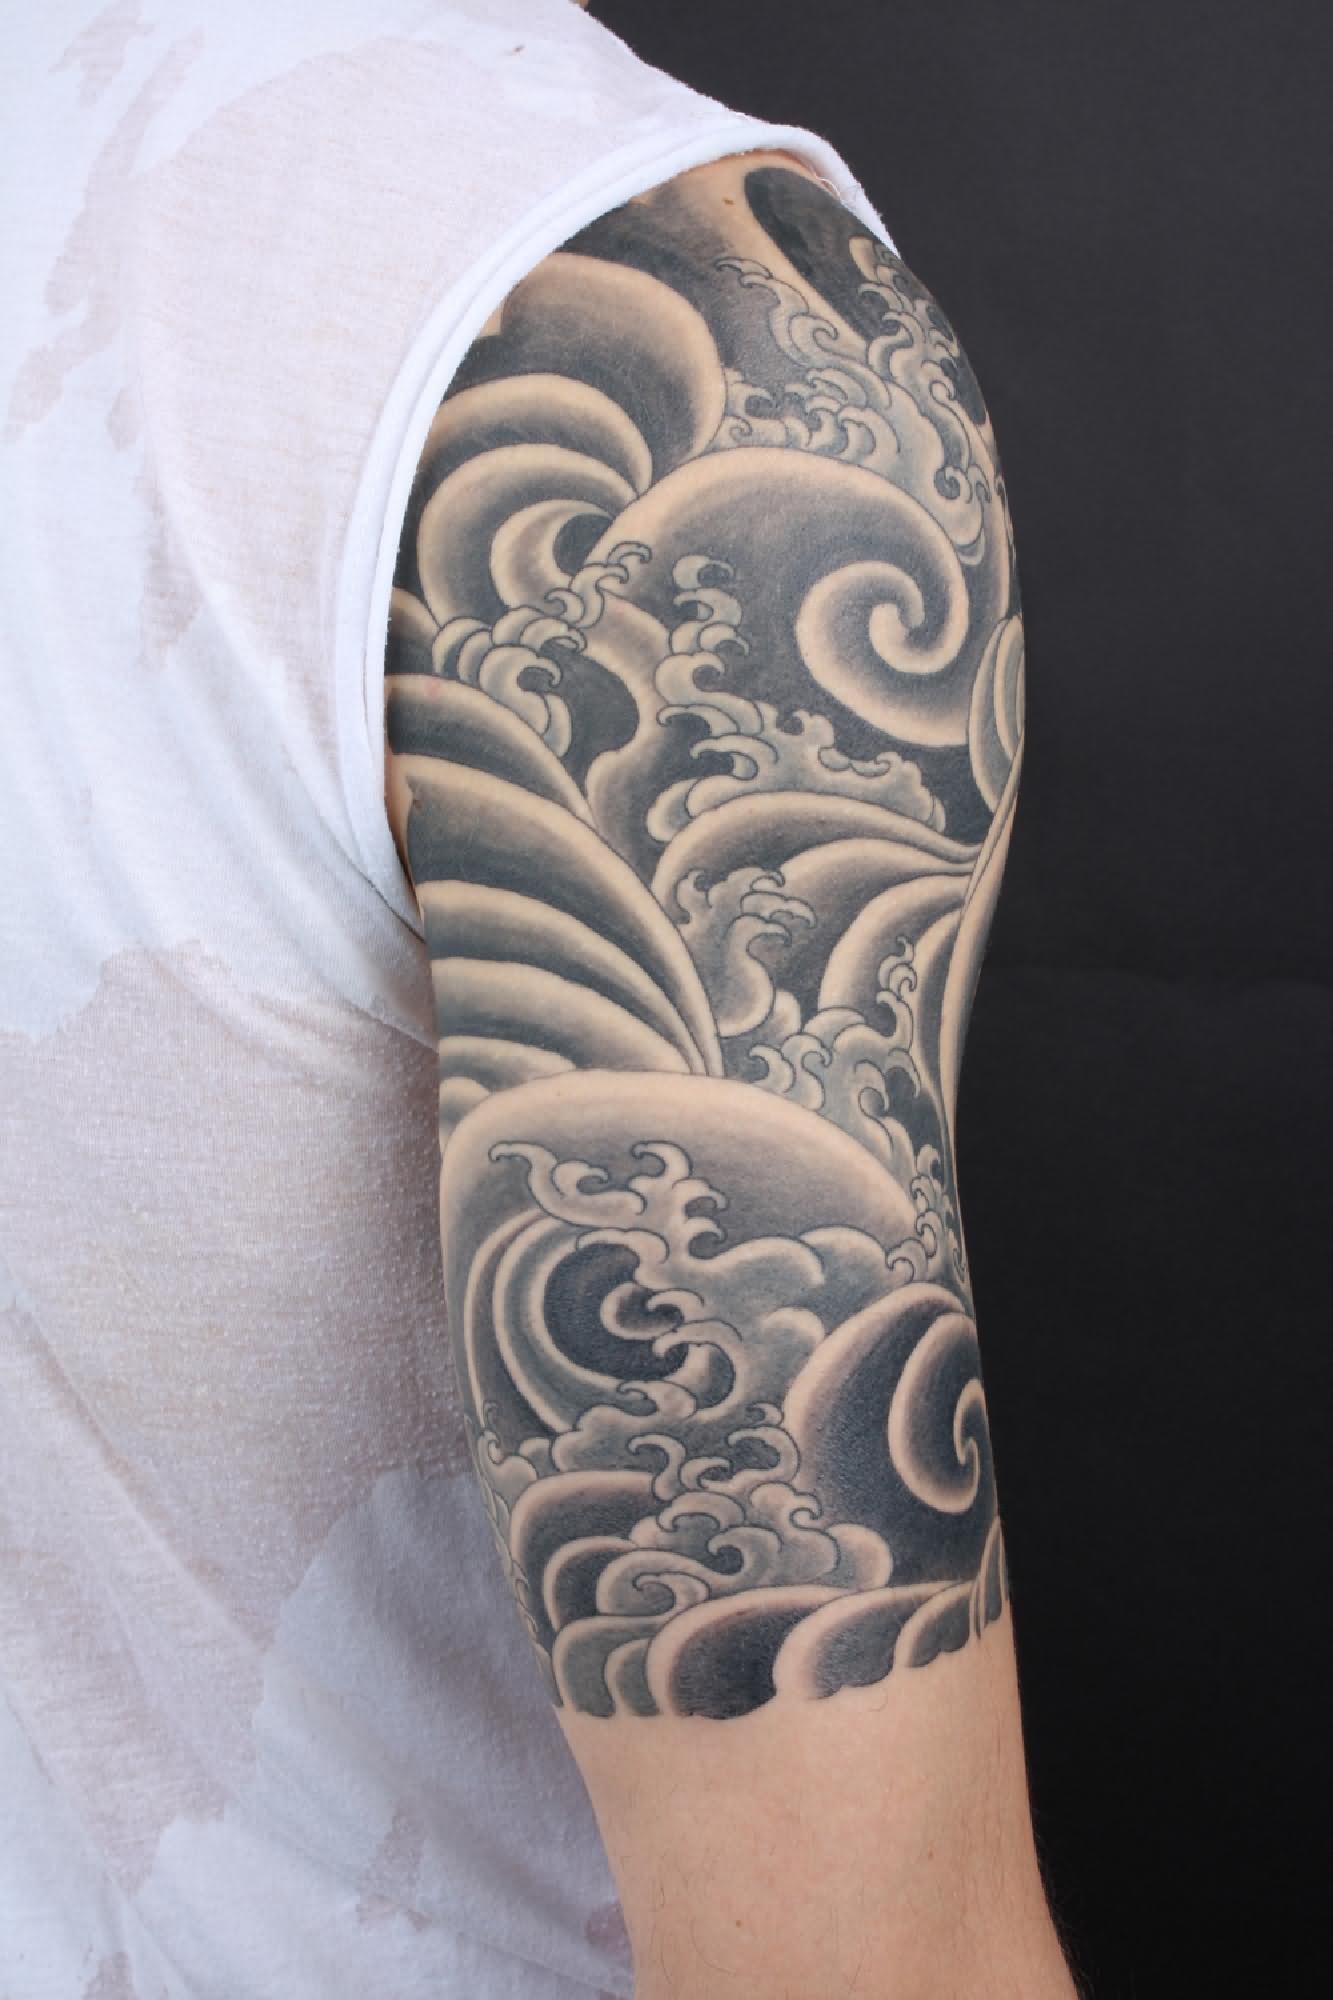 Half Sleeve Cloud Tattoos For Men 14+ Half Sleeve...